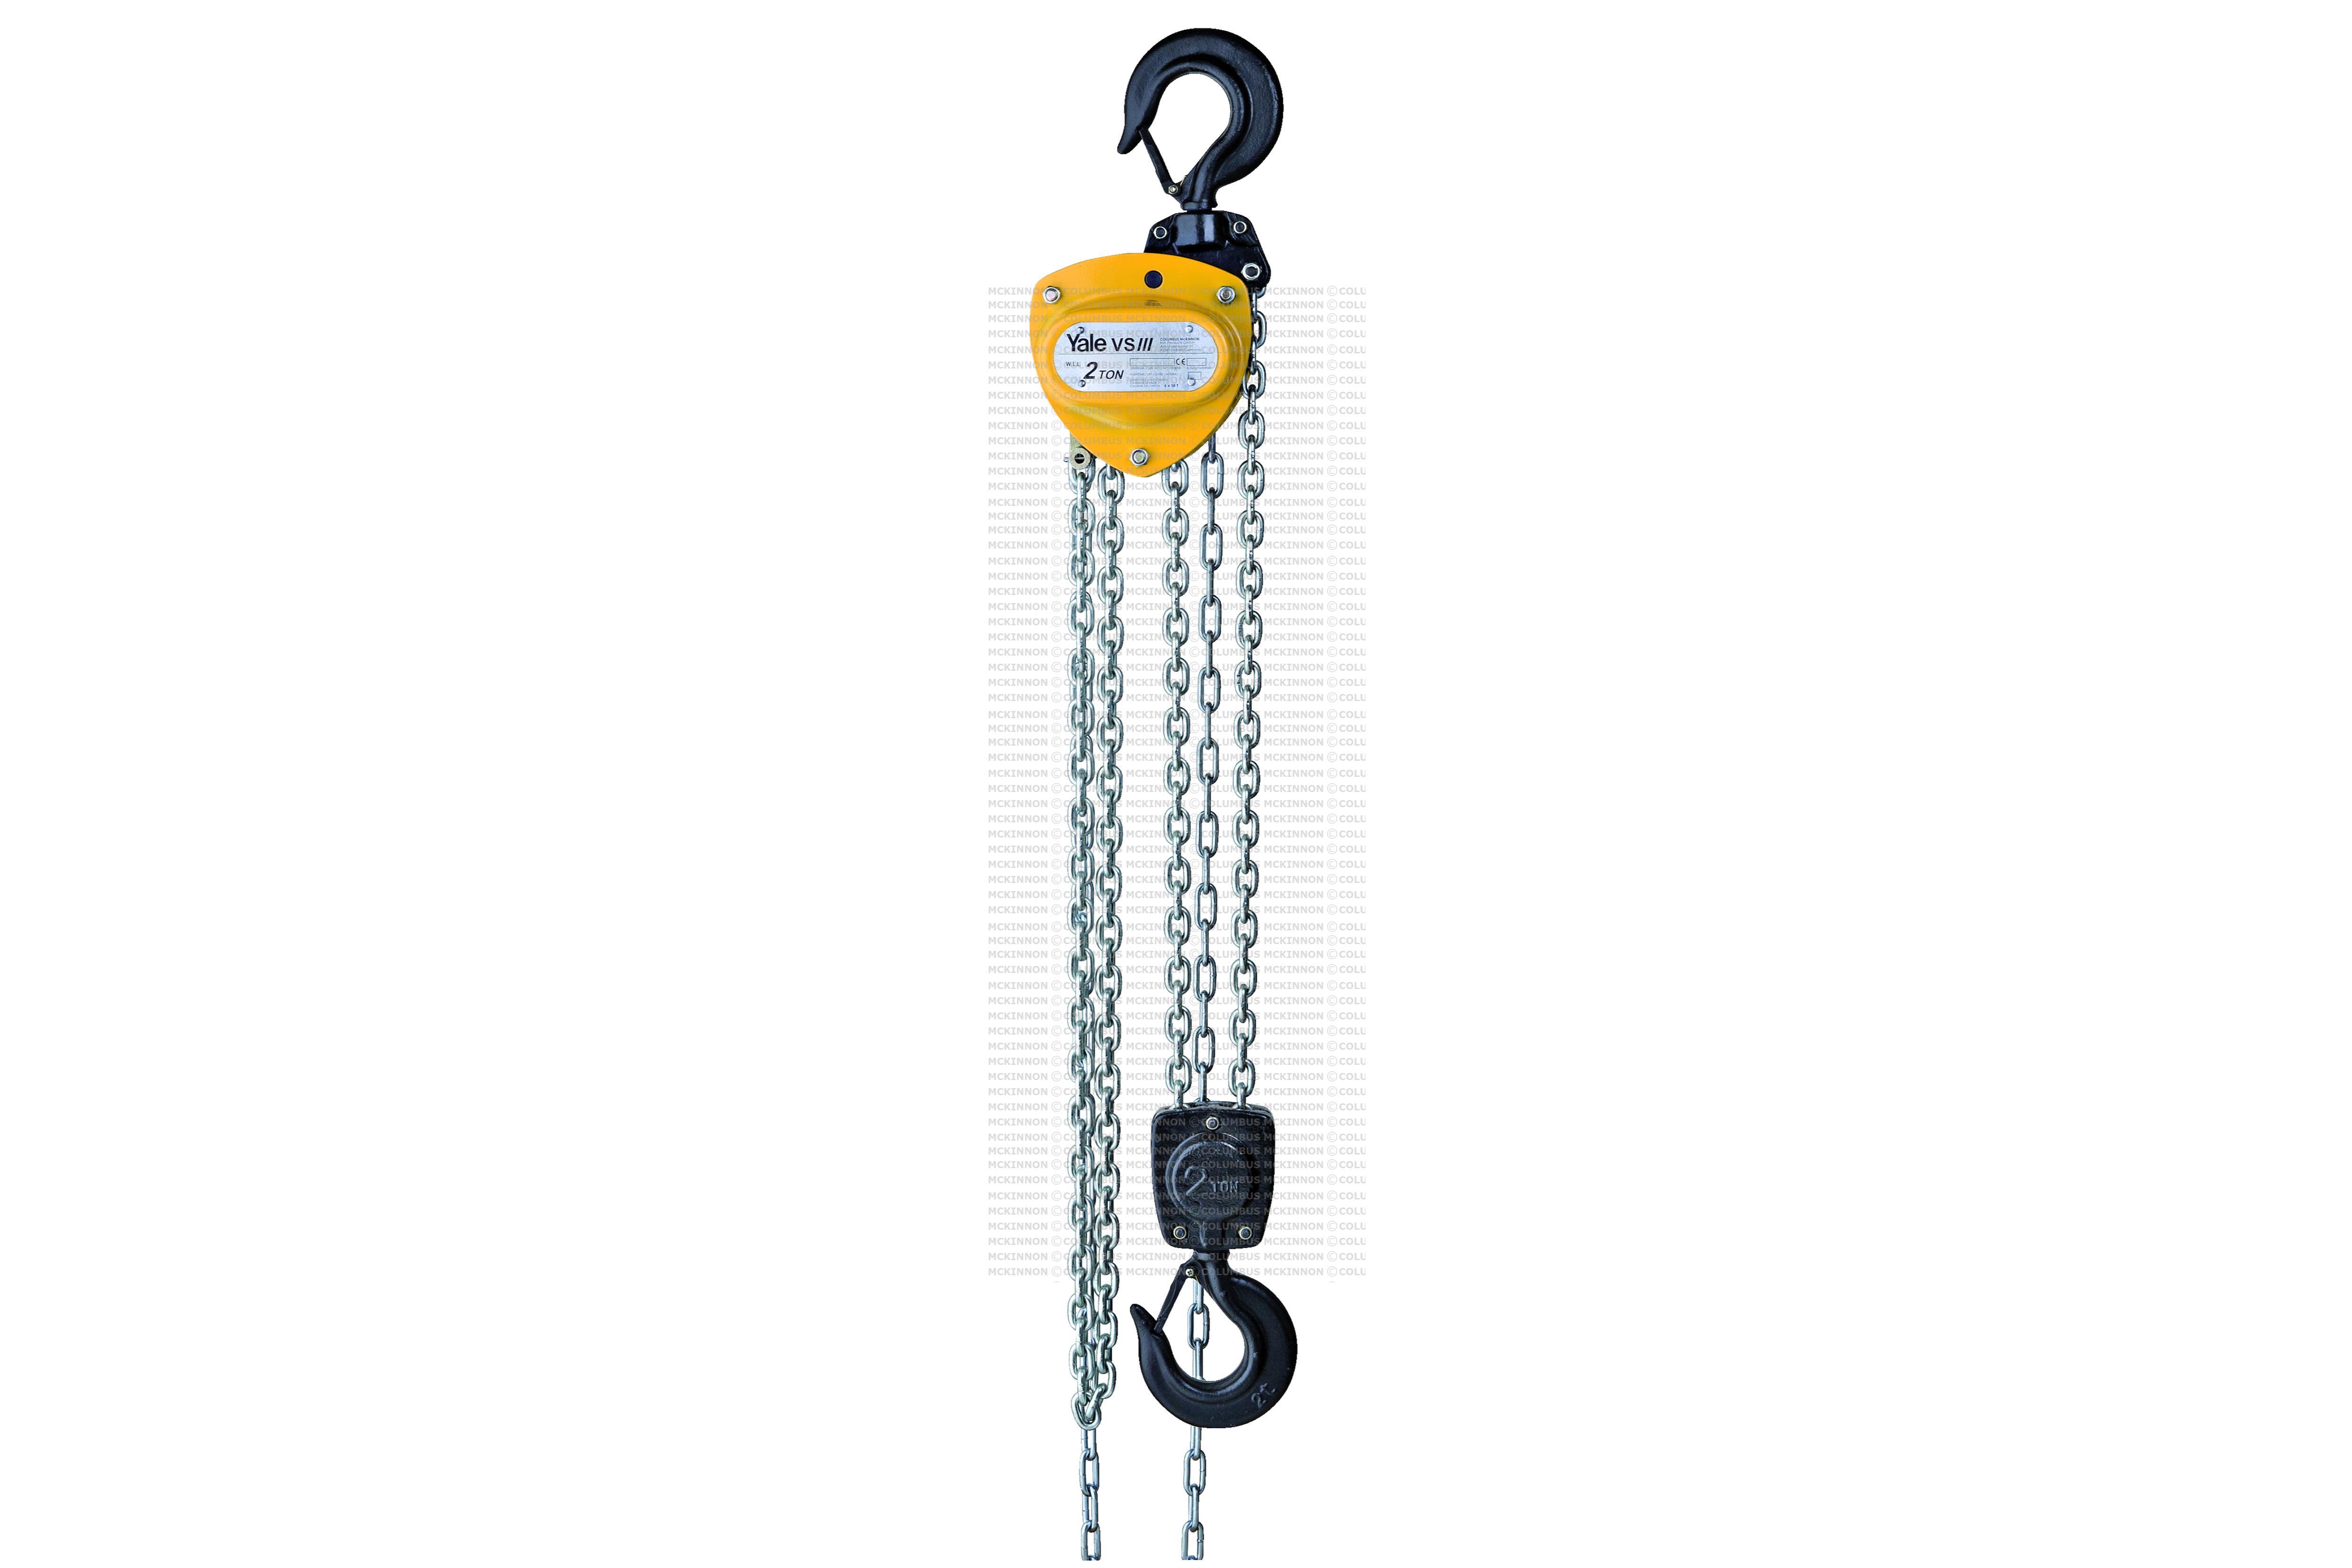 Yale Electric Hoist Wiring Diagram Forklift 1 Ton Chain Best 2018rh